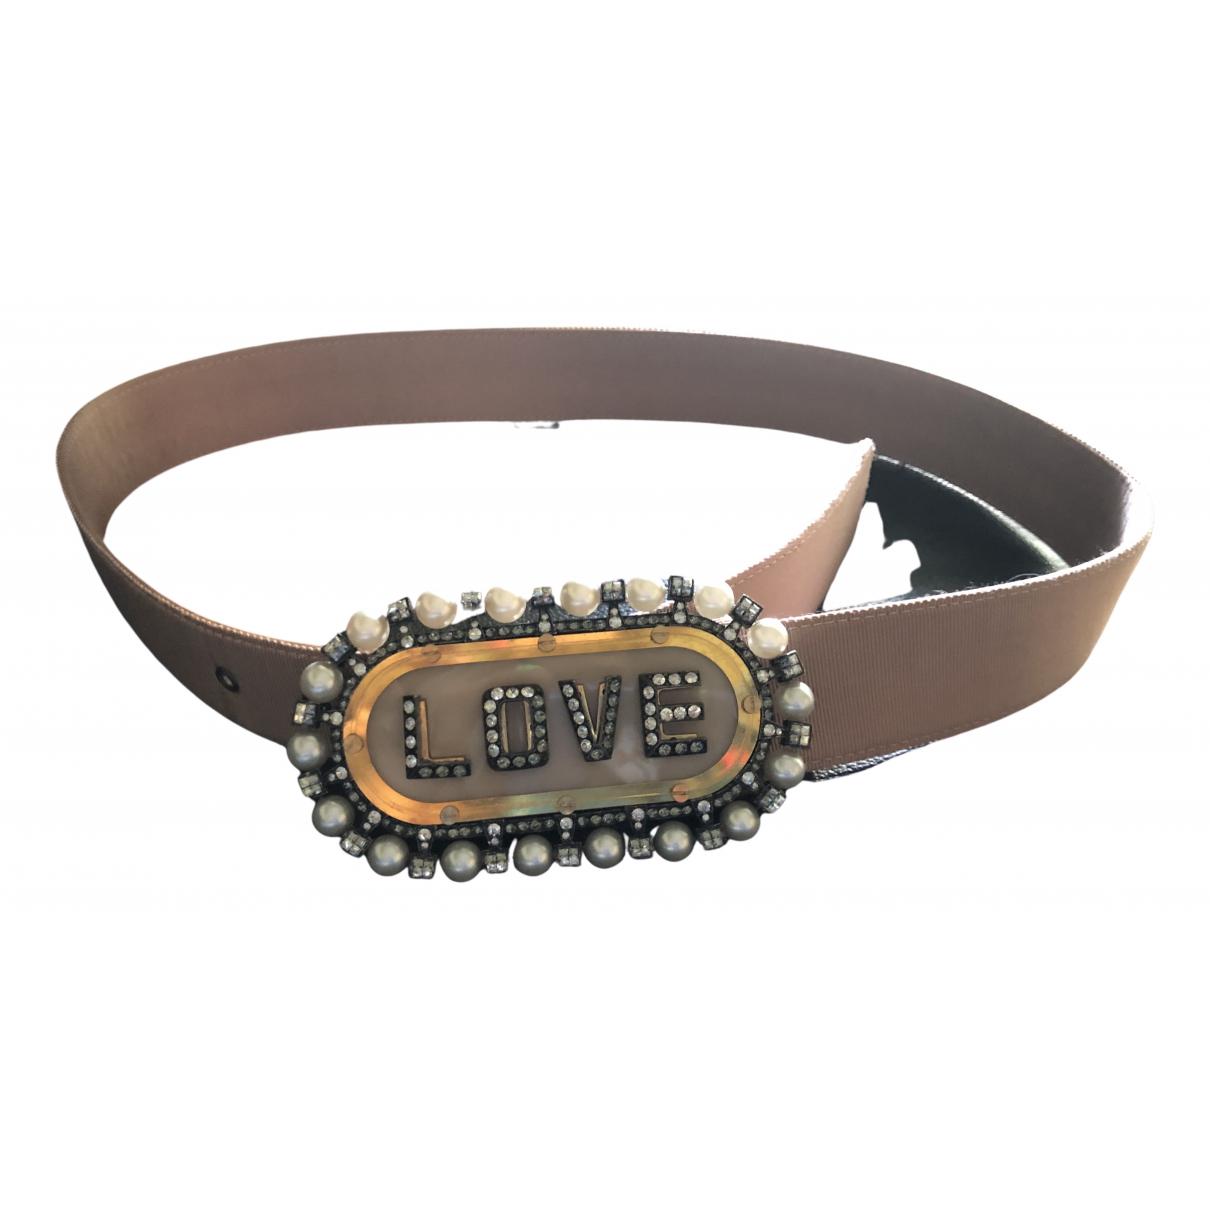 Lanvin \N Beige Cloth belt for Women M International